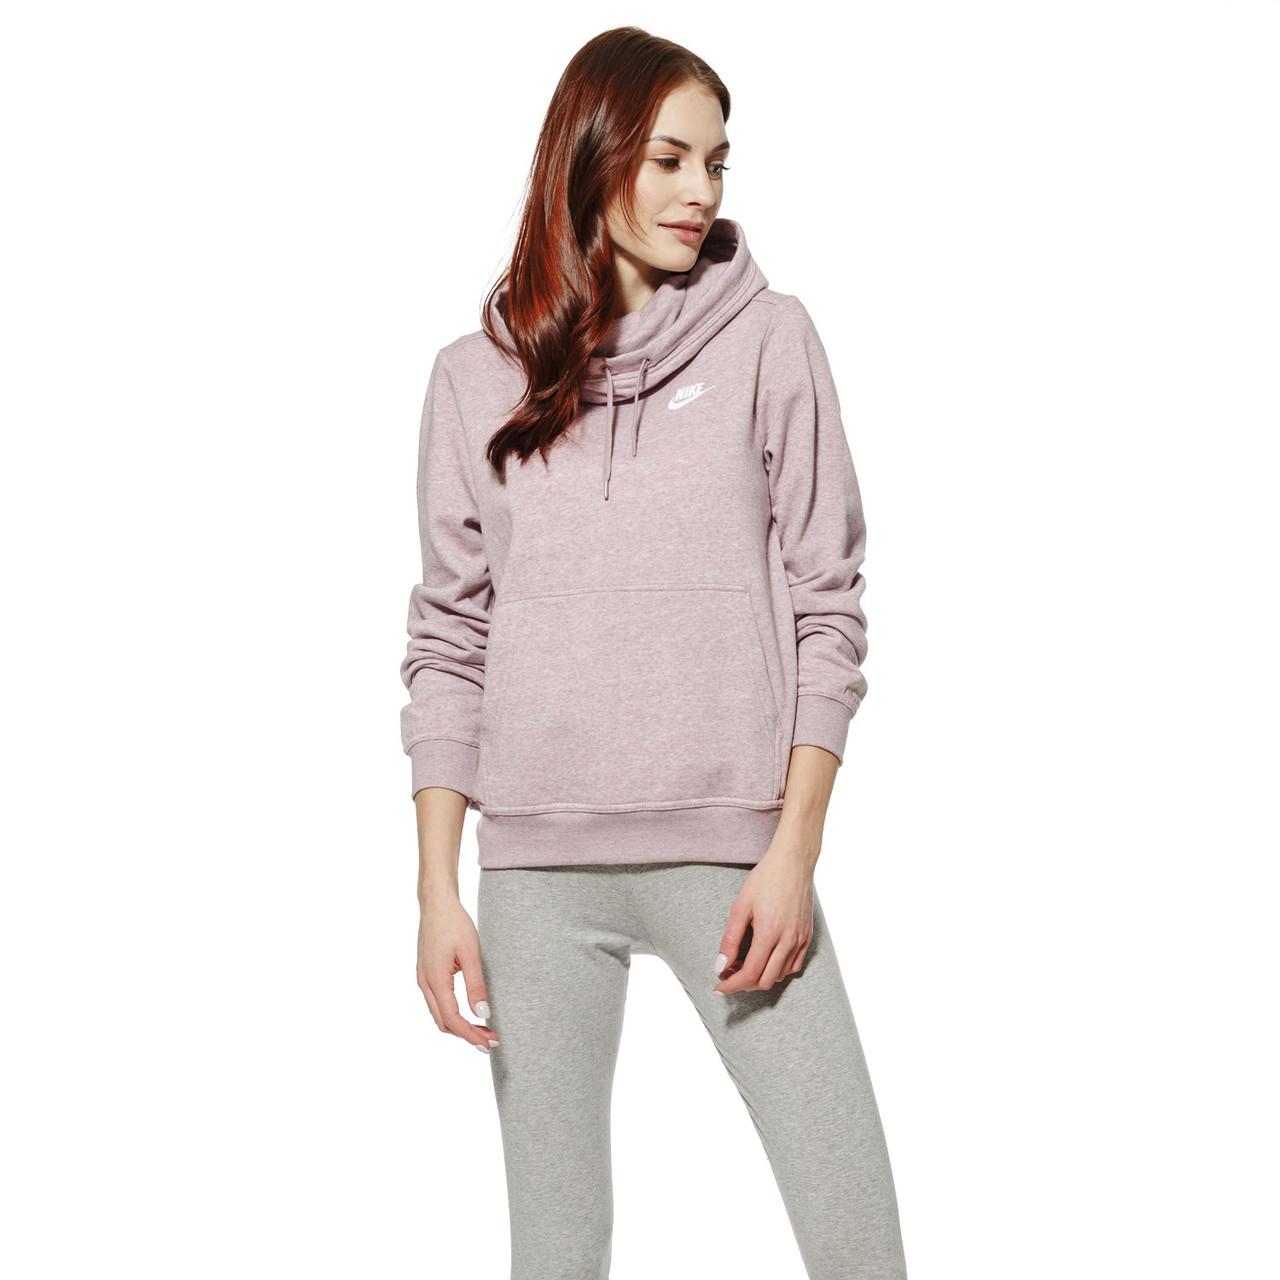 Женская Толстовка Nike Nsw Fnl Flc 853928-694 (Оригинал) - Football Mall - 24363dd3aa035